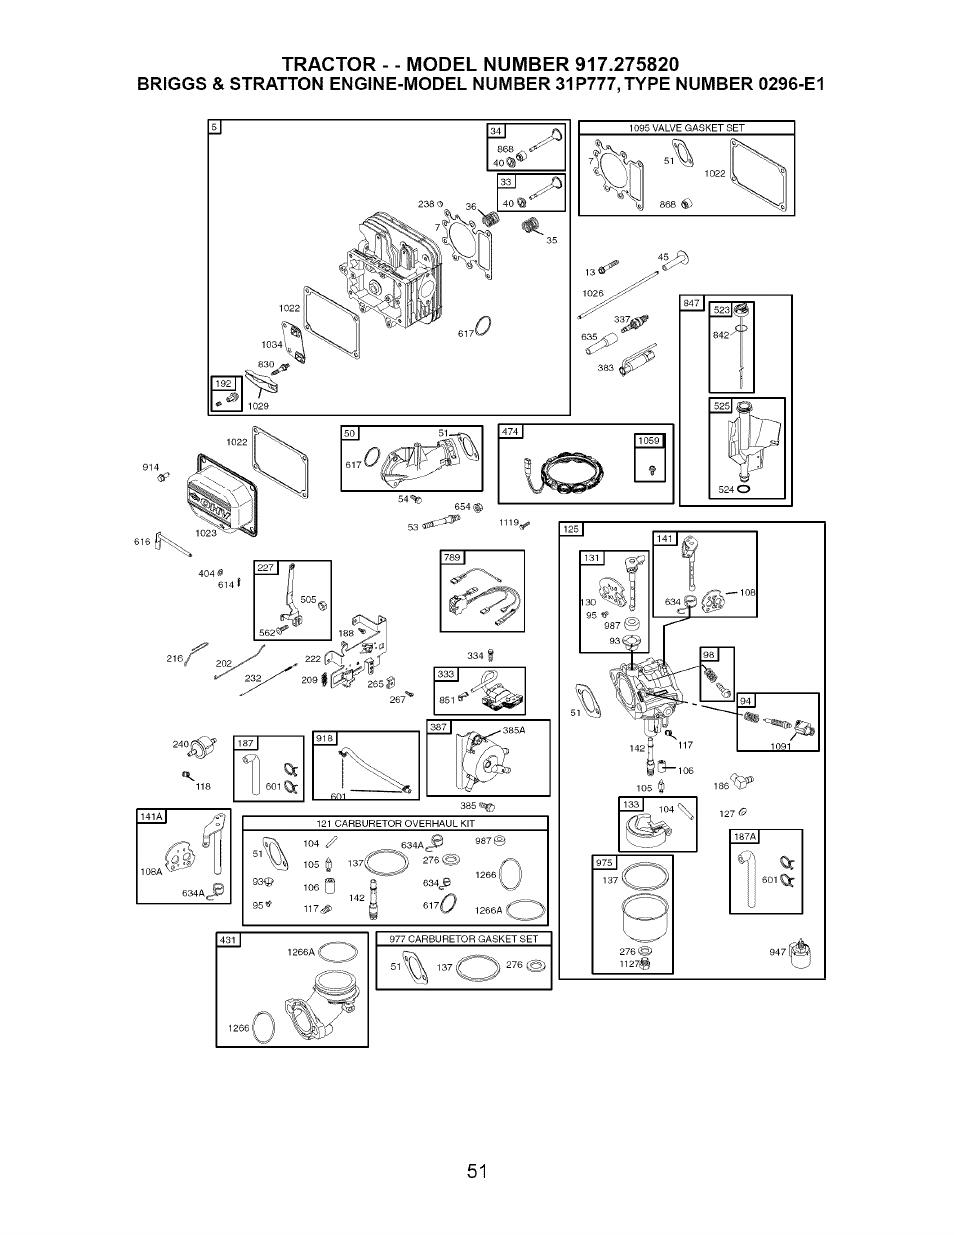 972 craftsman dlt 3000 wiring diagram   wiring library  wiring library